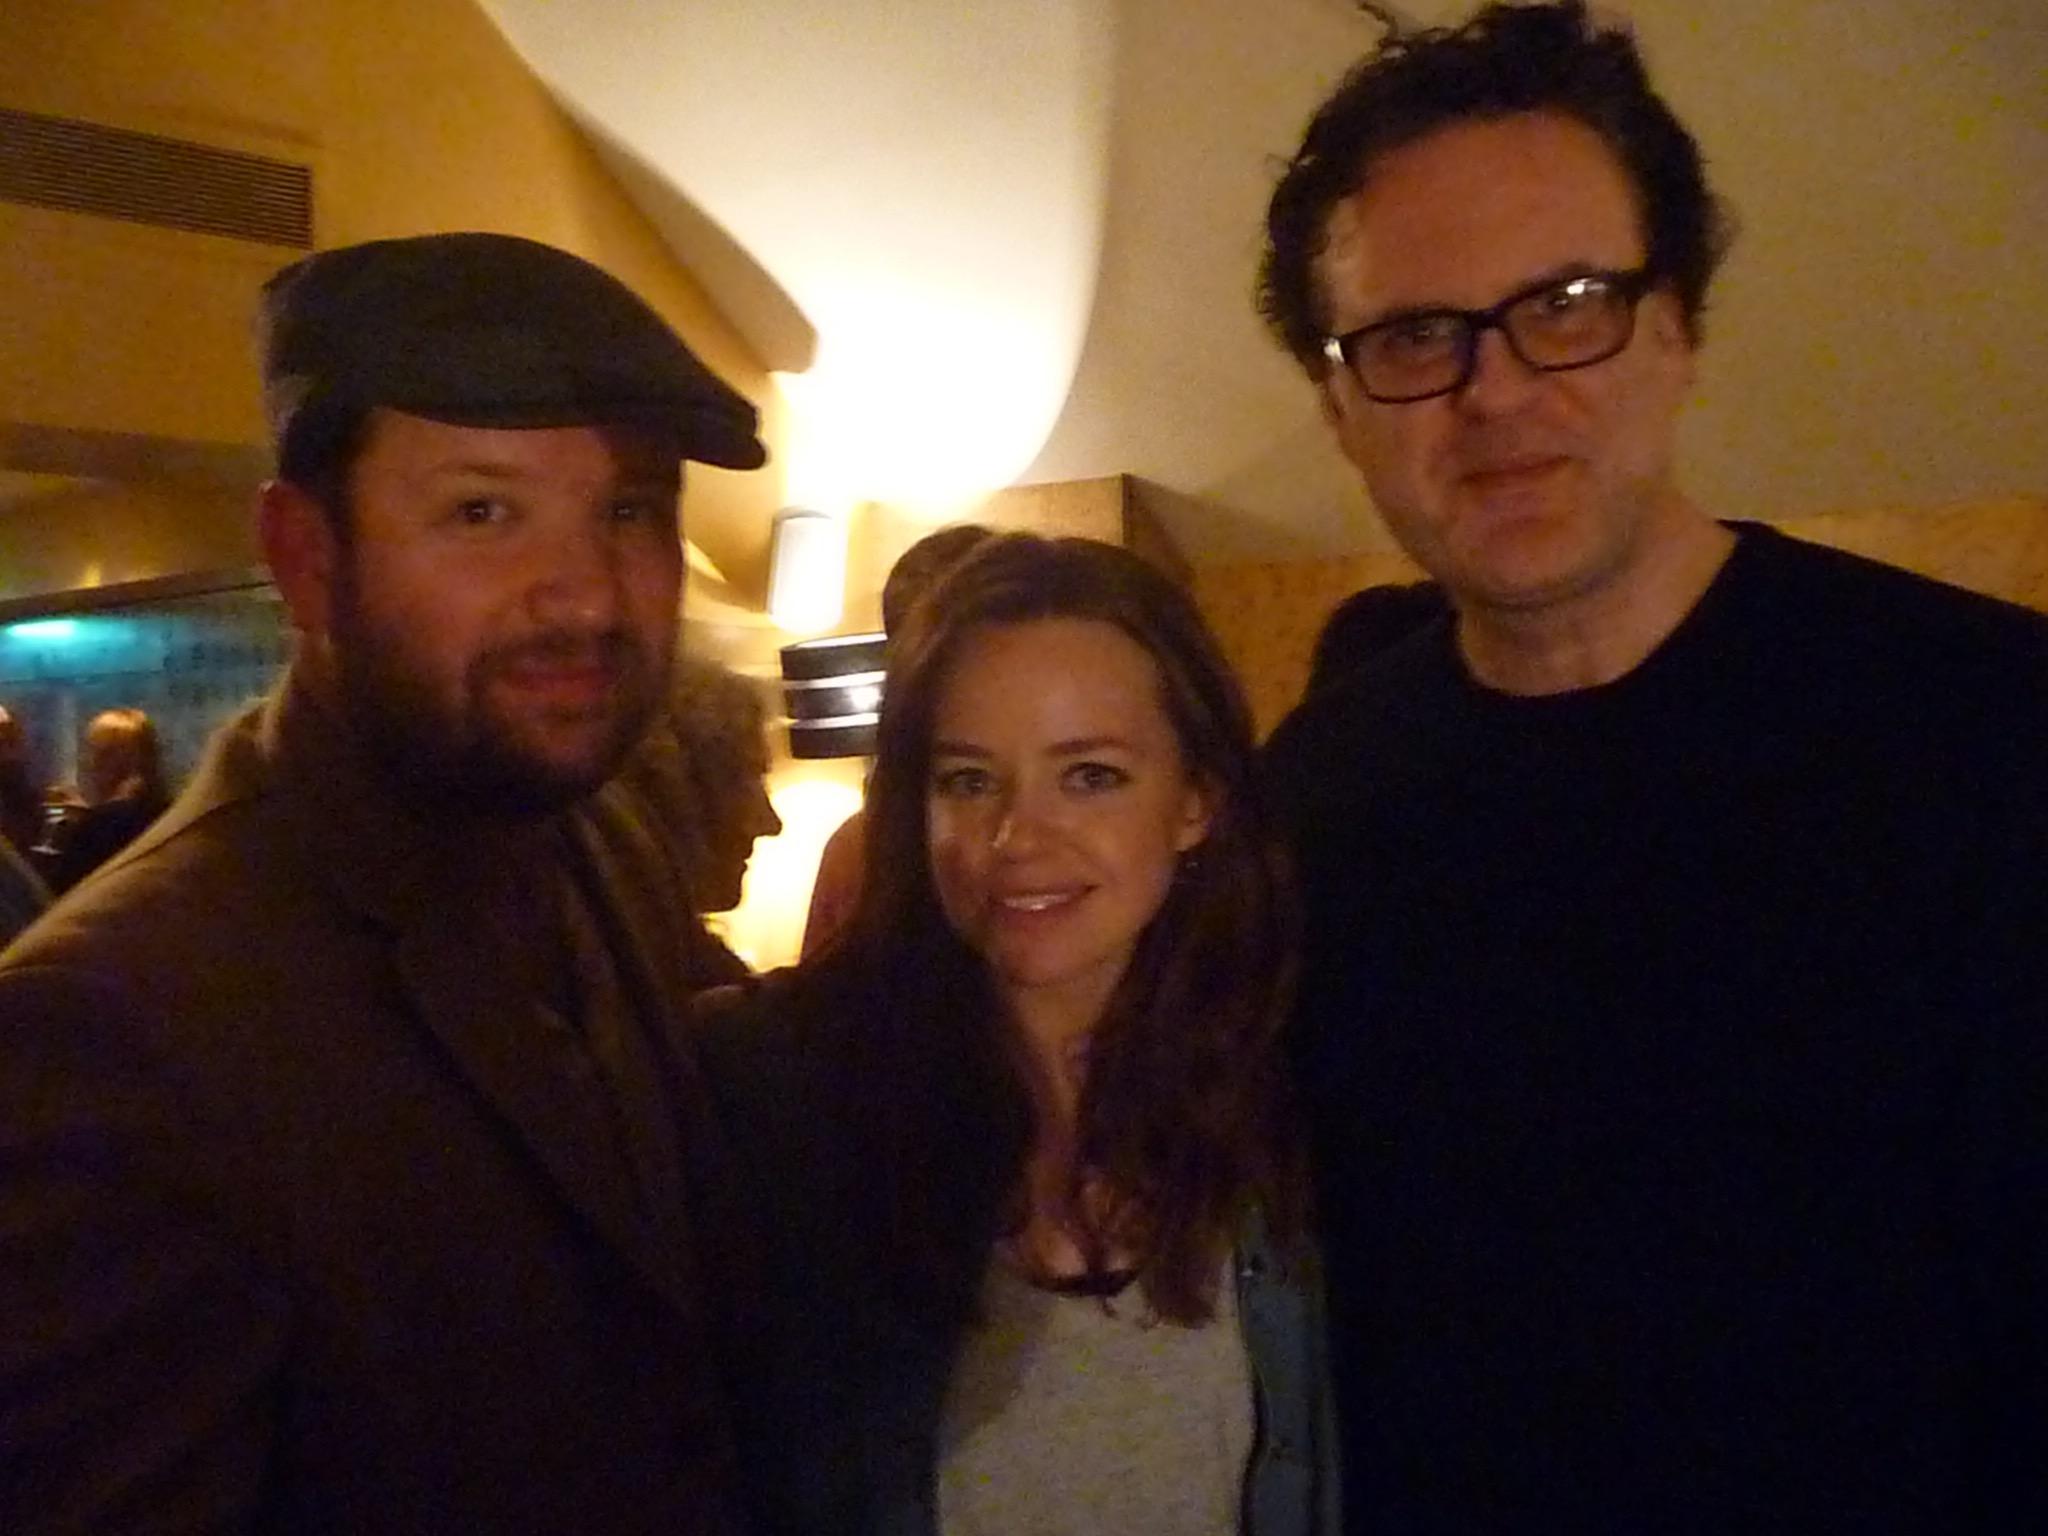 Director Ben Cogan, Director Ian Barnes and Actress Georgie Taylor at CCP Presents Networking Event